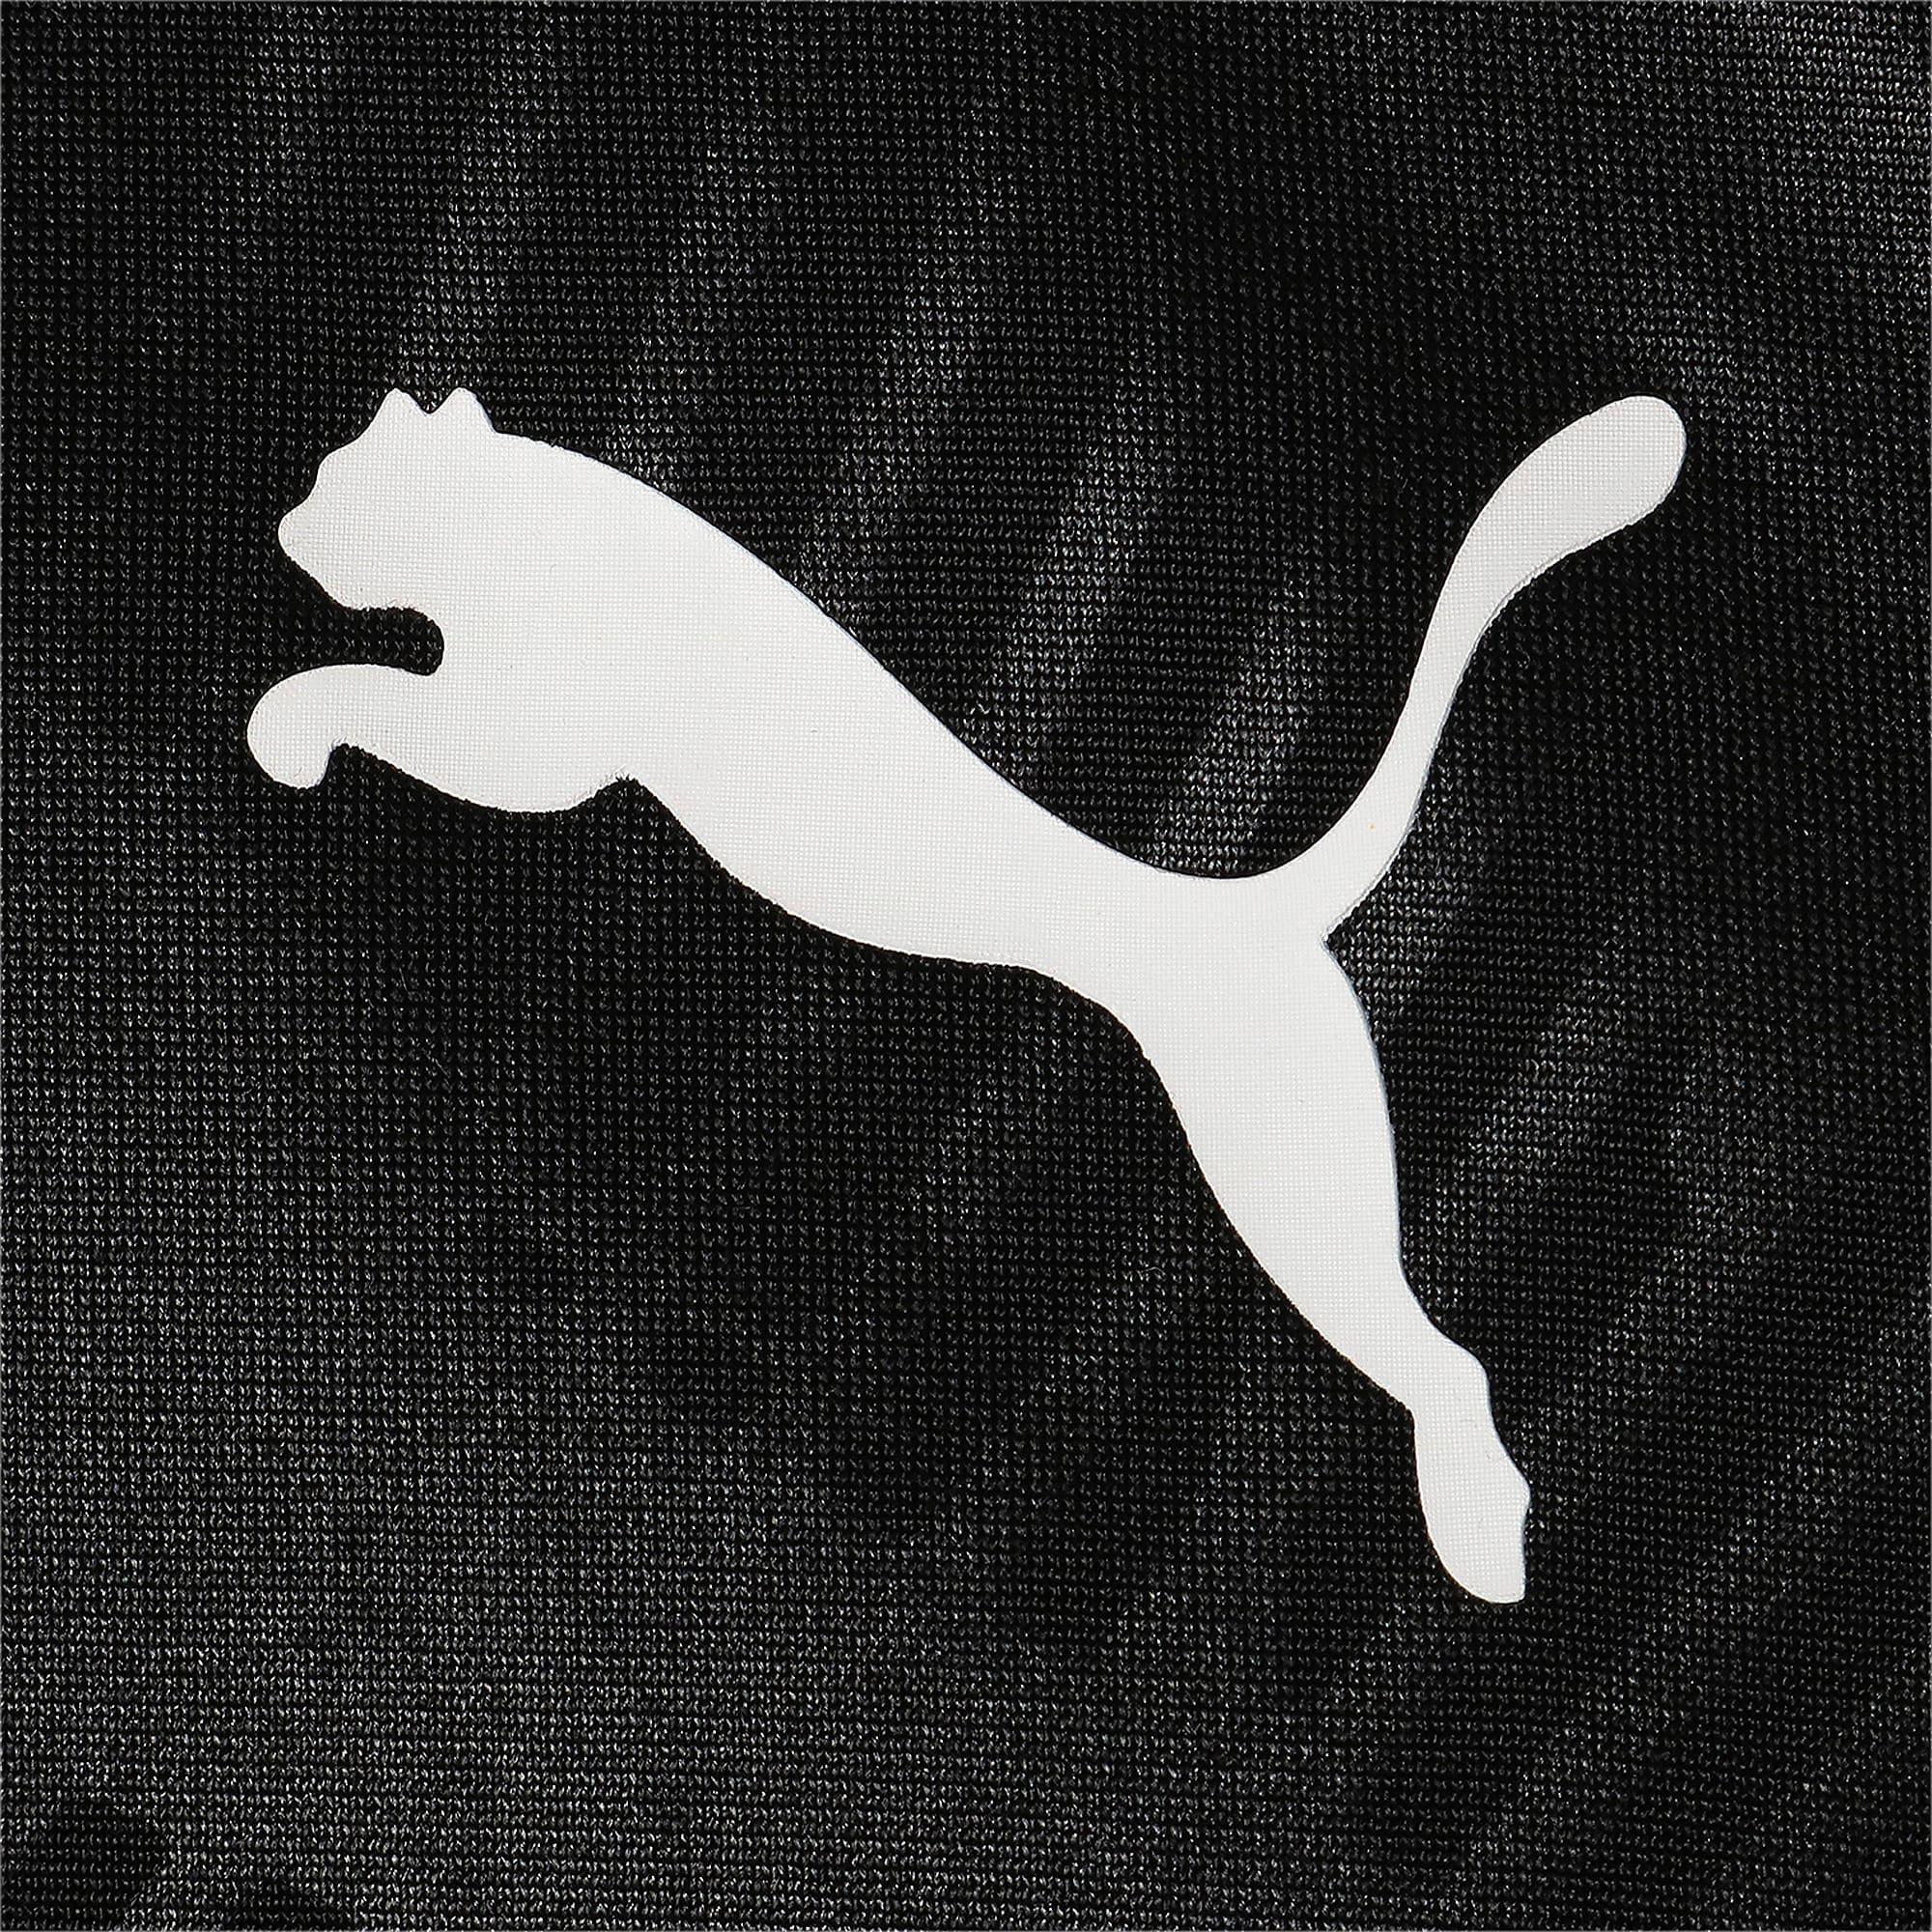 Thumbnail 4 of カップ トレーニング ジャケット コア, Puma Black-Asphalt, medium-JPN